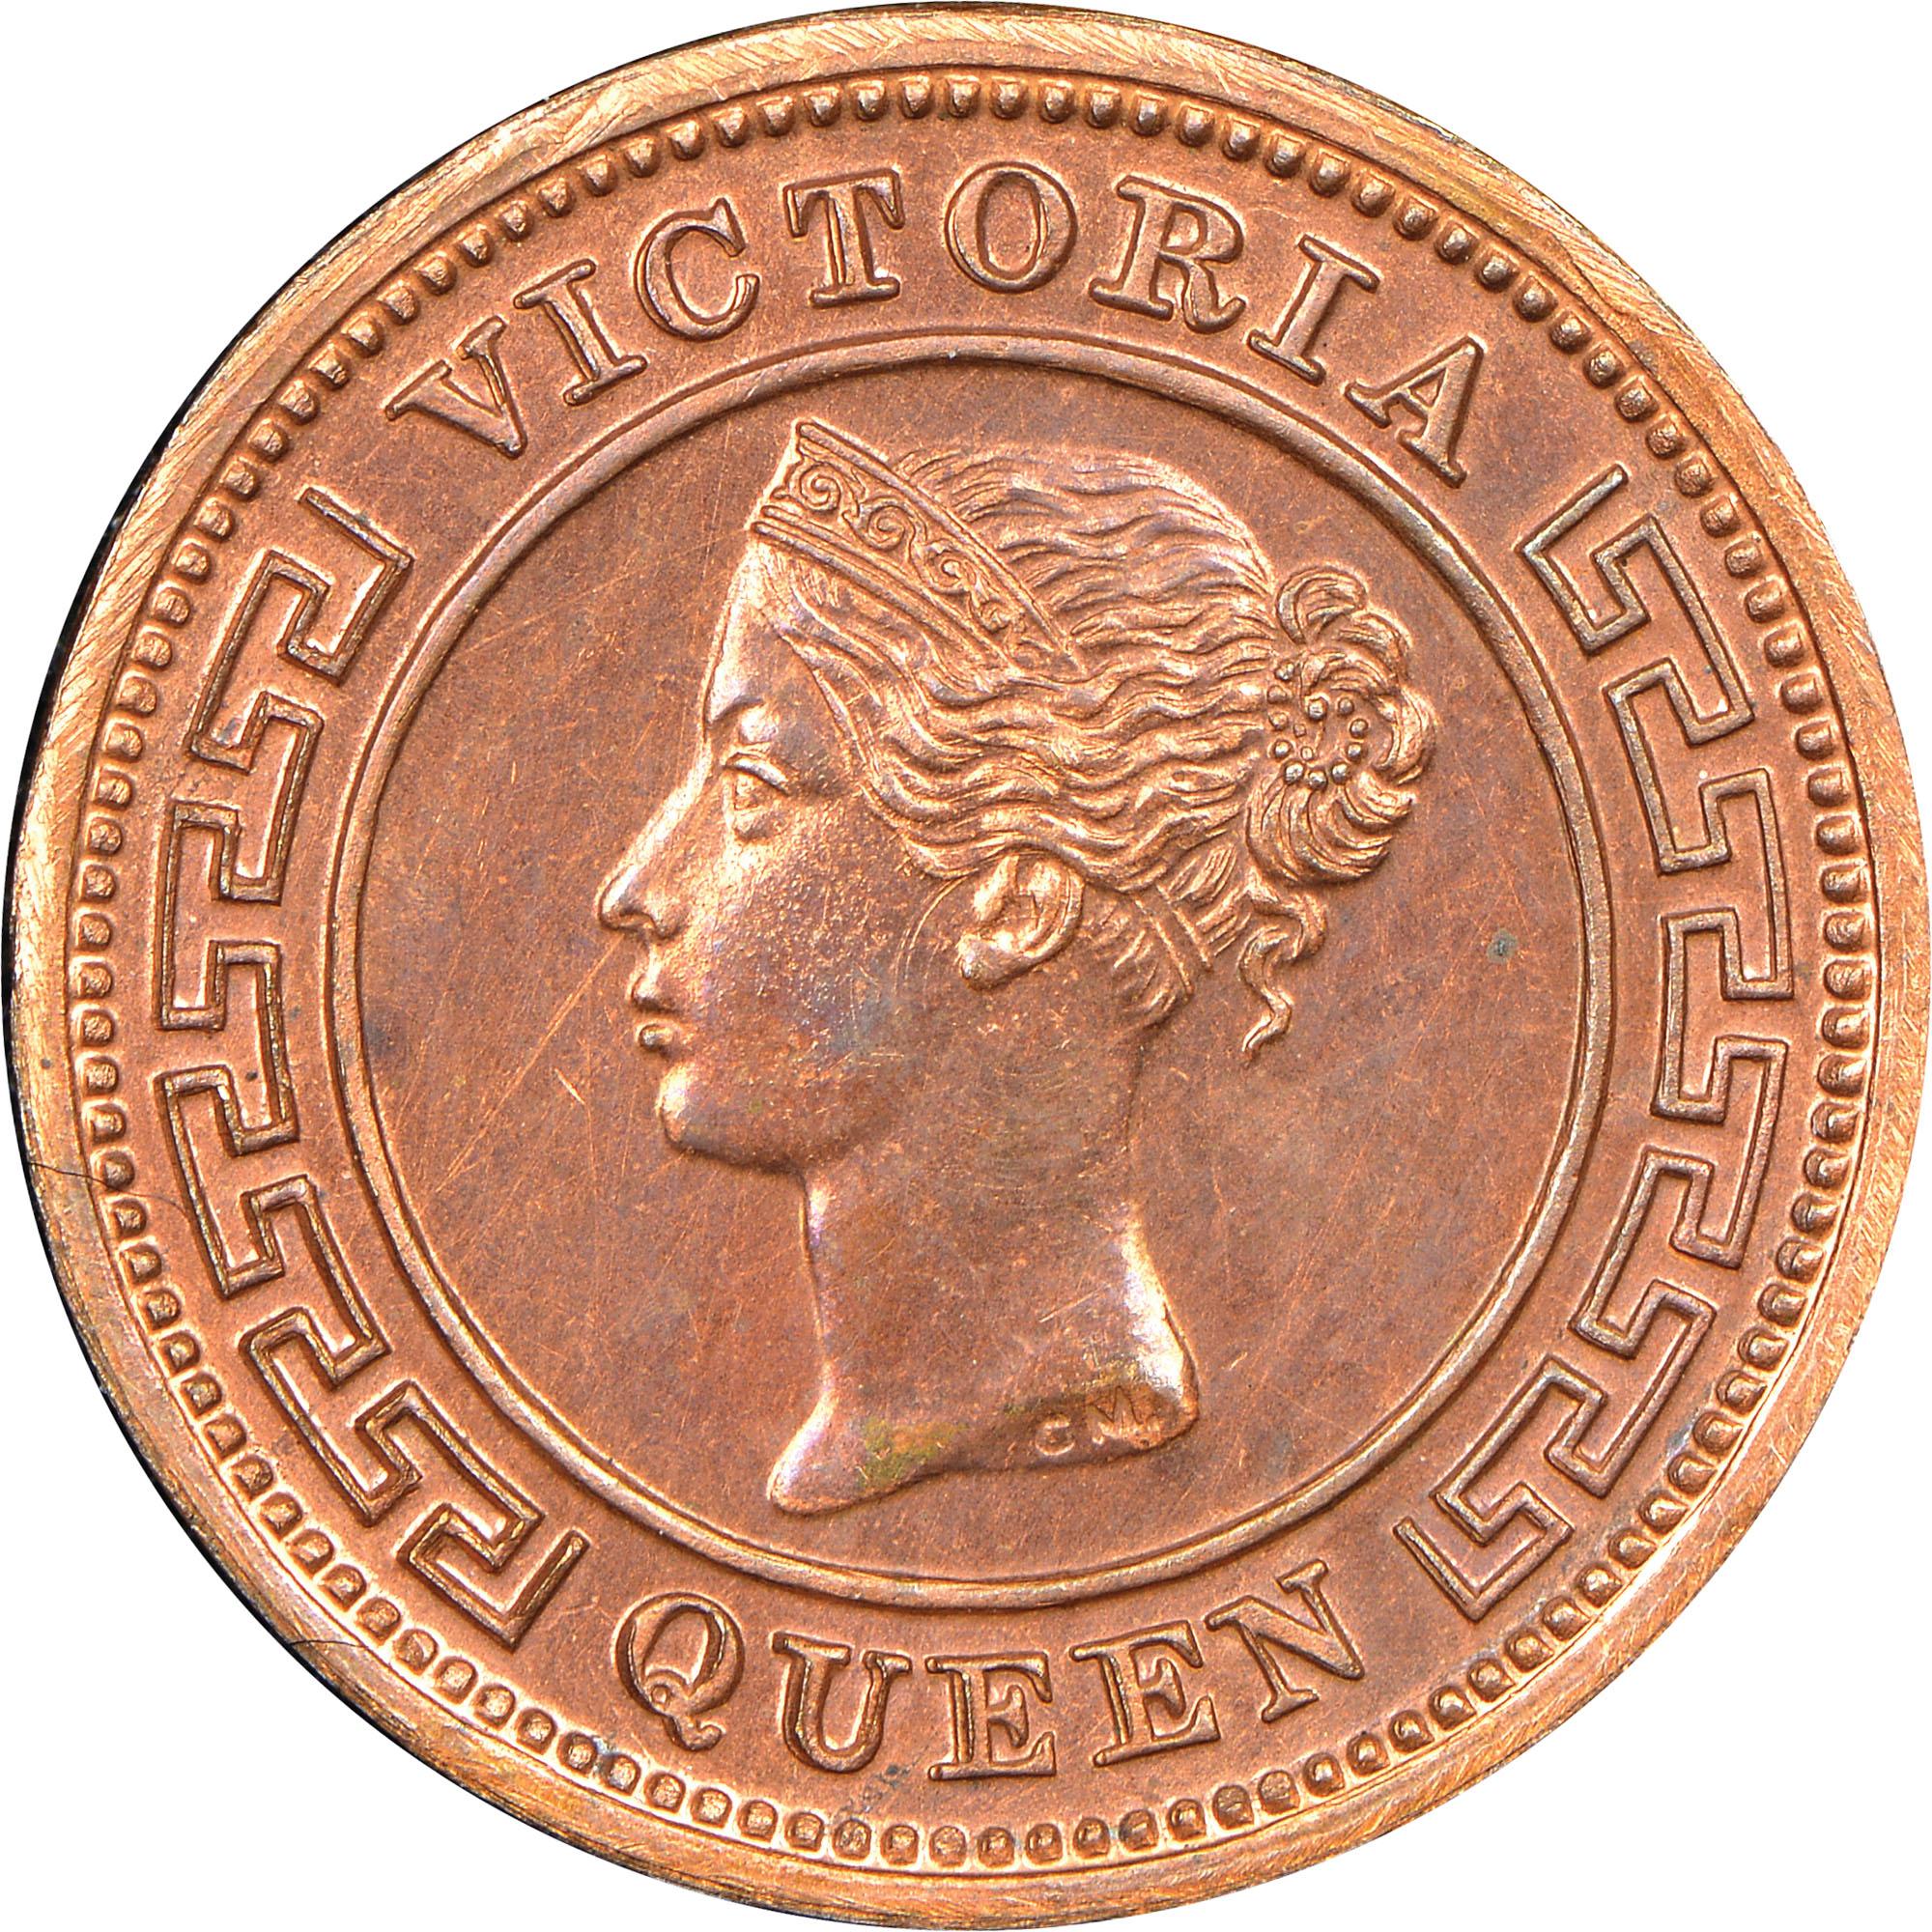 1870-1901 Ceylon 1/4 Cent obverse